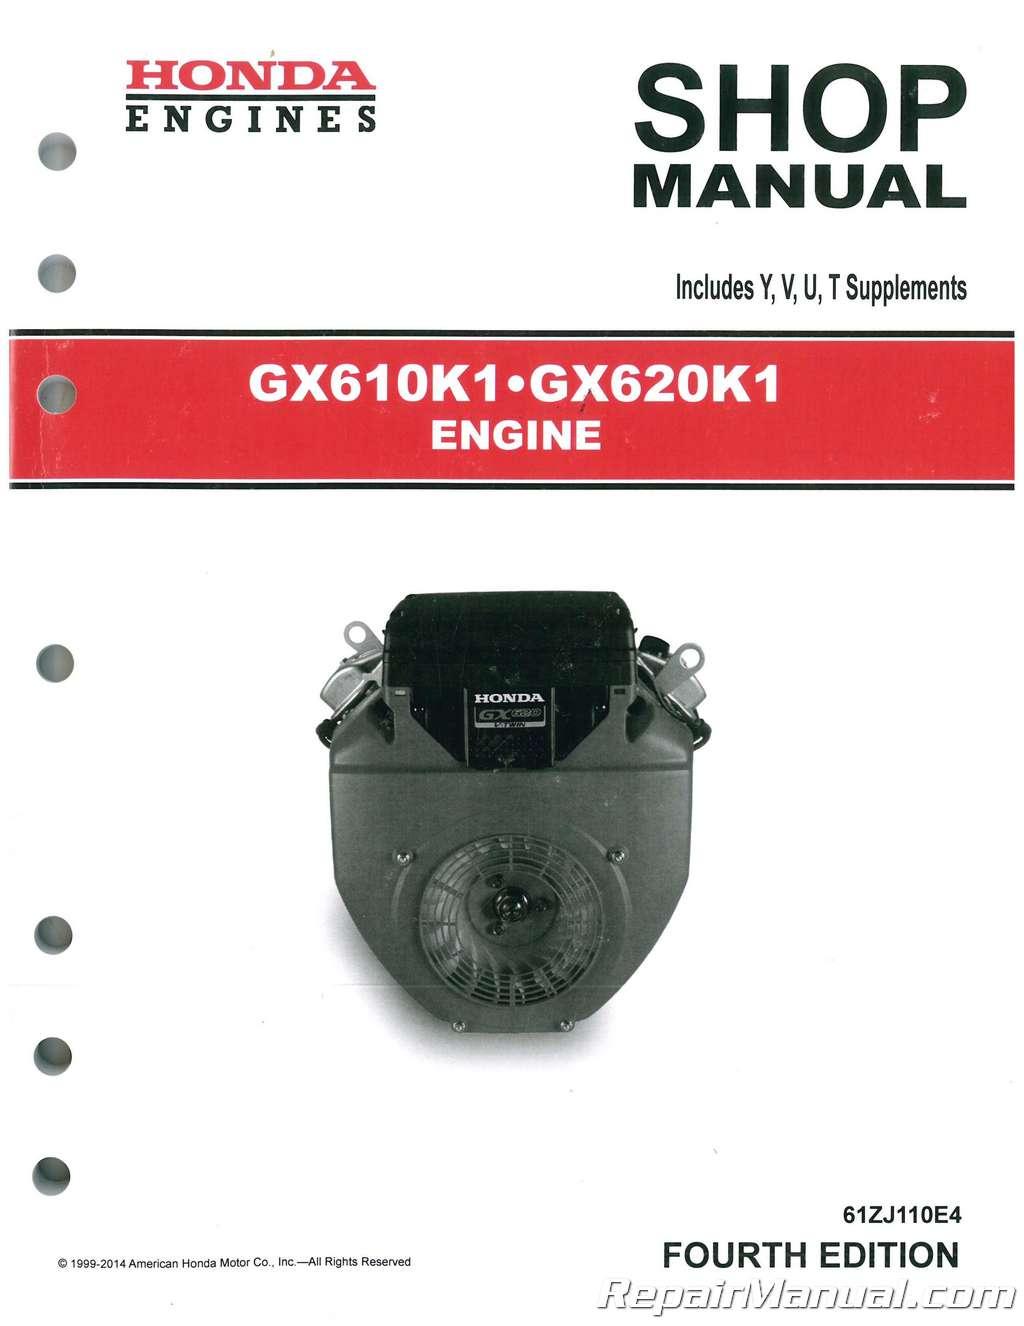 Honda Gx 120 Service Manual Circuitlab Genie Garage Door Opener Mod Array Engine Shop One Word Quickstart Guide Book U2022 Rh Jazzyeffort Com